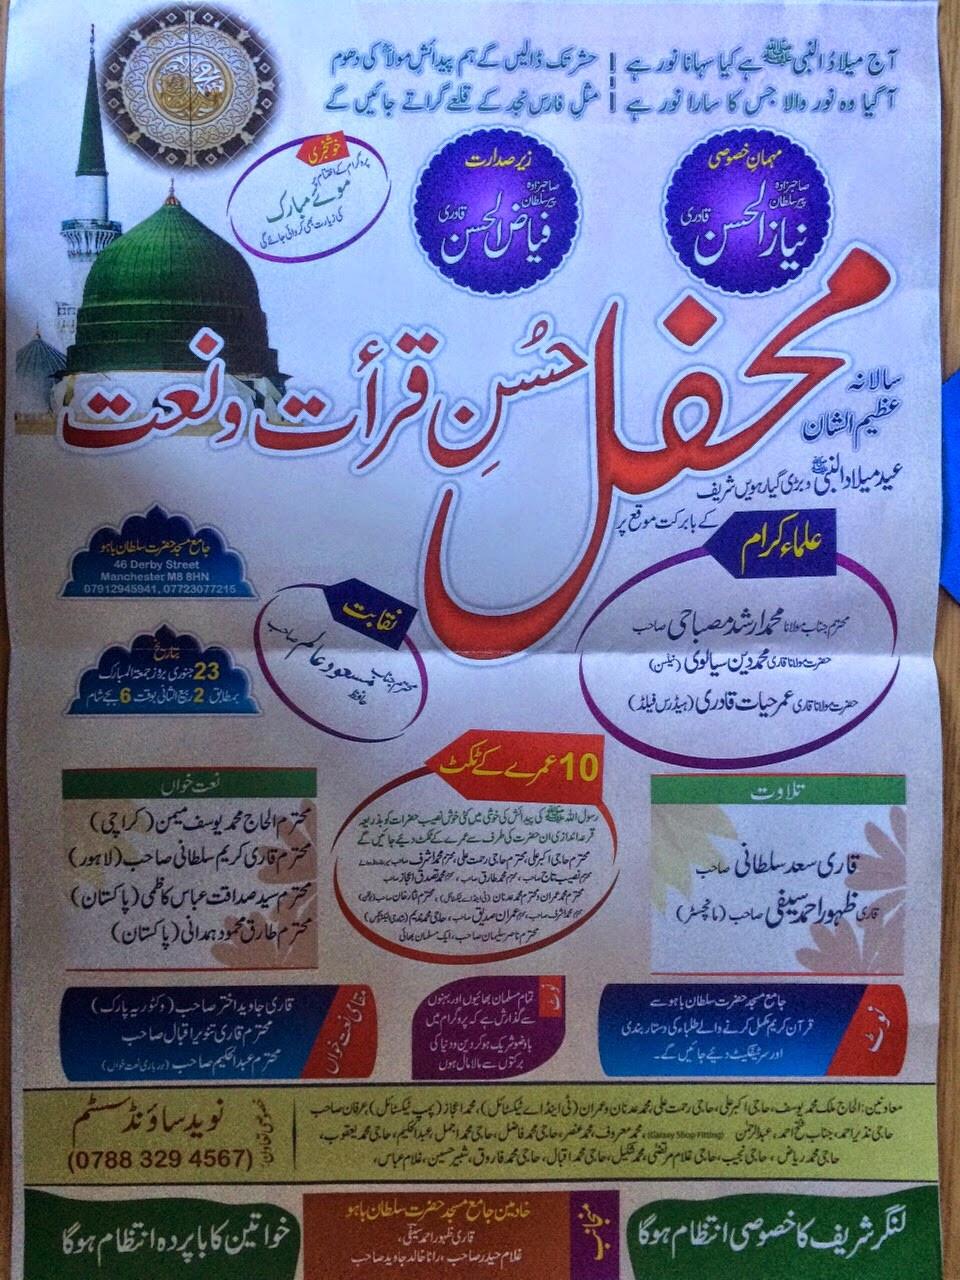 Husn_qirat_naat.jpg